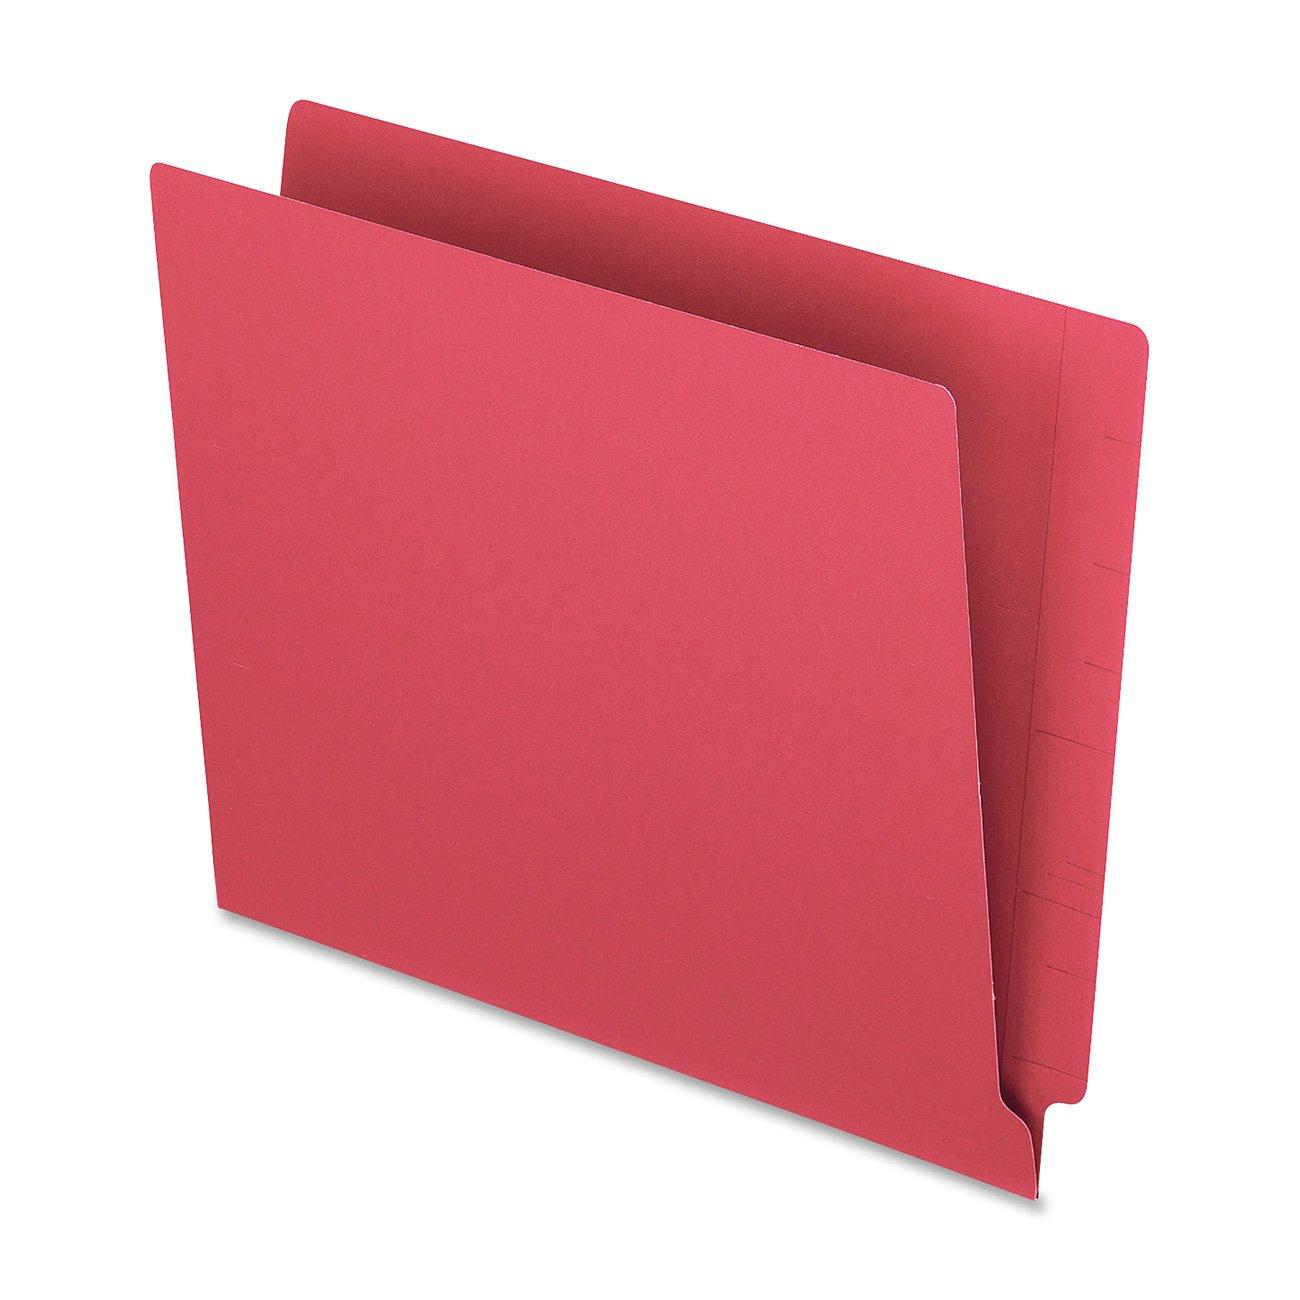 Pendaflex Colour End Tab Folders, Full Tab, Letter, Red, 100/Box Esselte H110DR